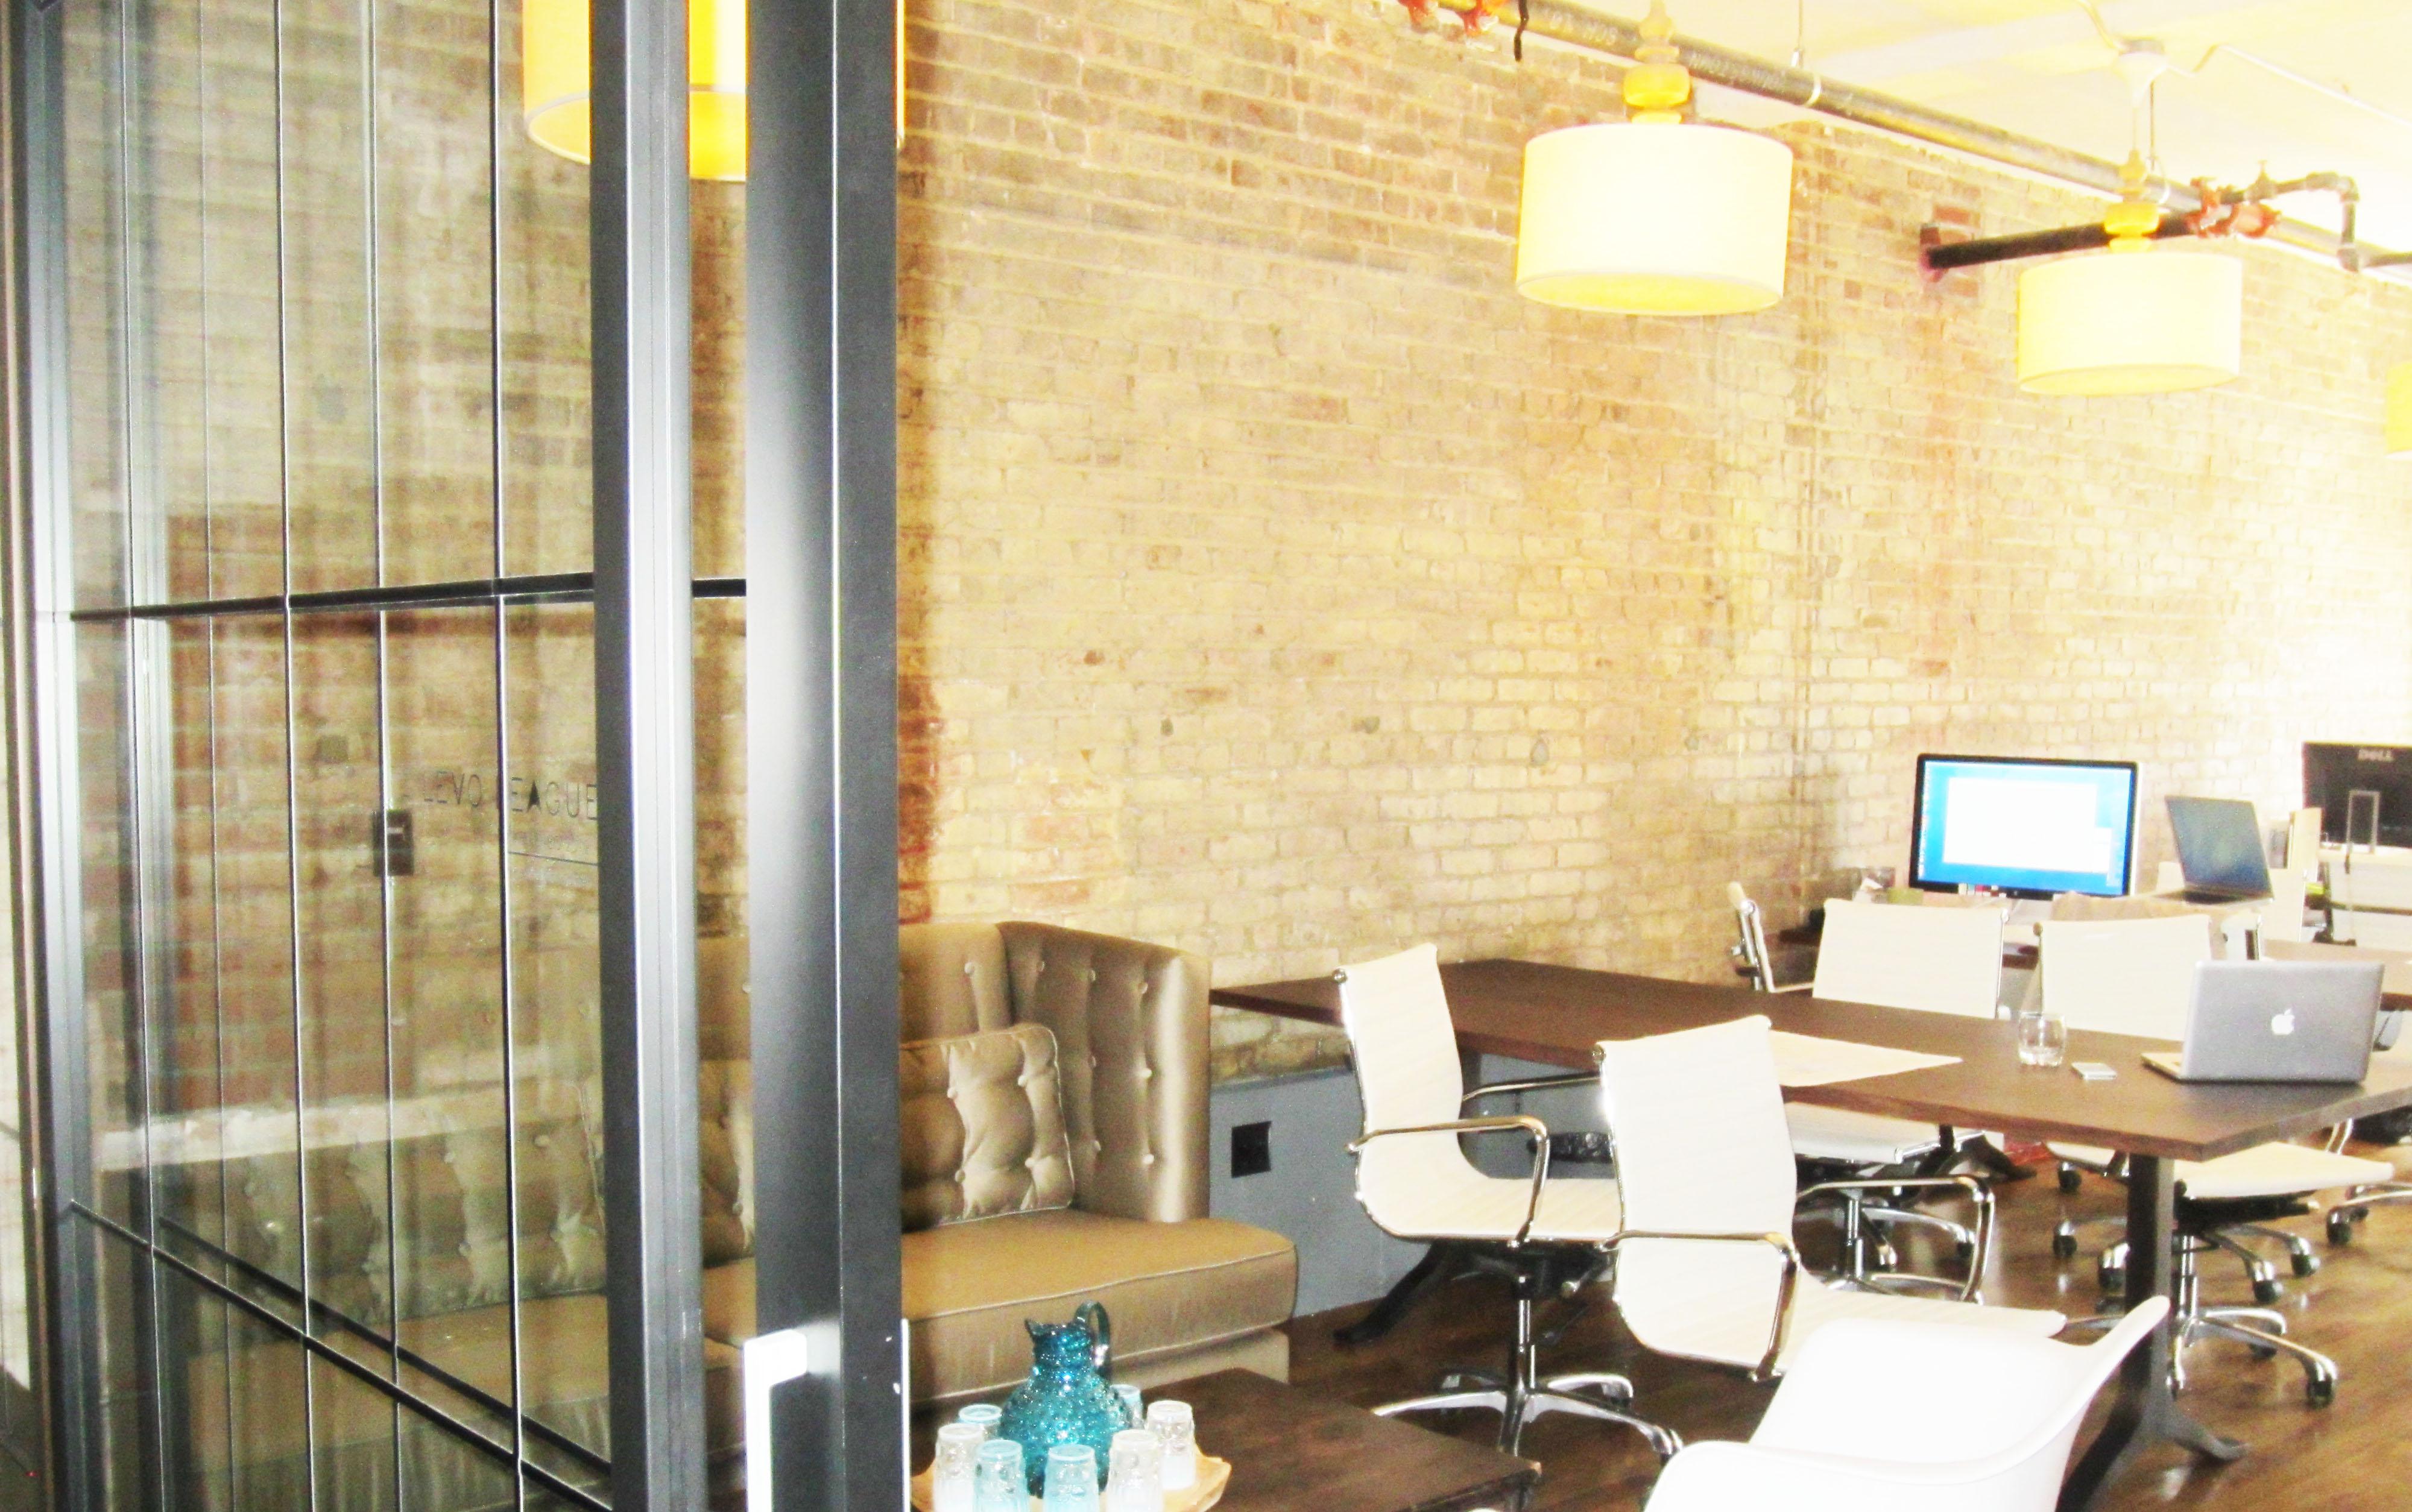 exposed brick | OfficeEnvy